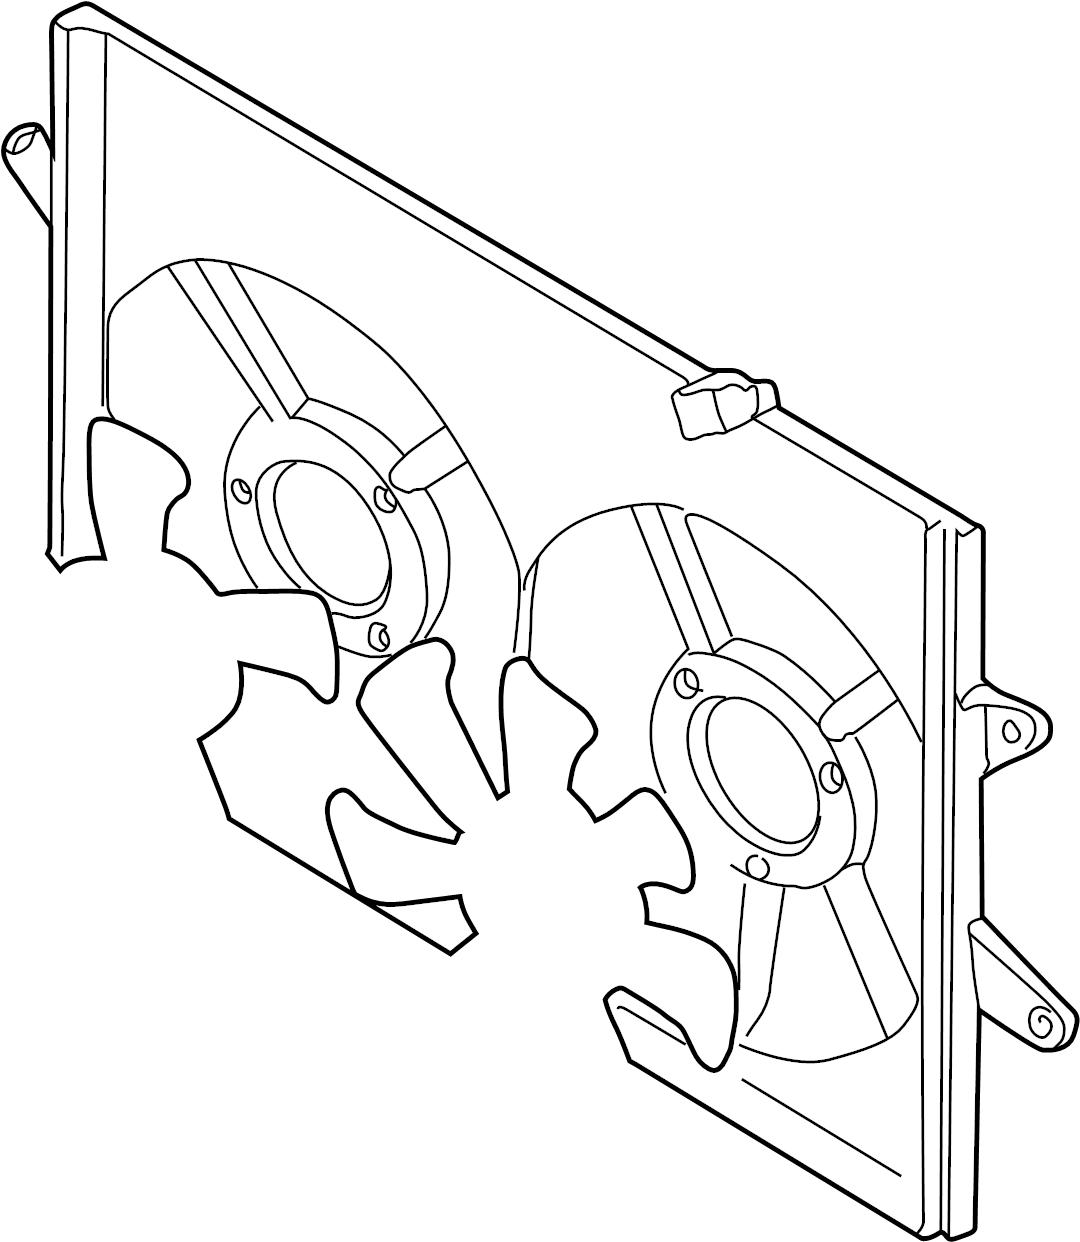 Mazda 626 Engine Cooling Fan Shroud. Make, Radiator